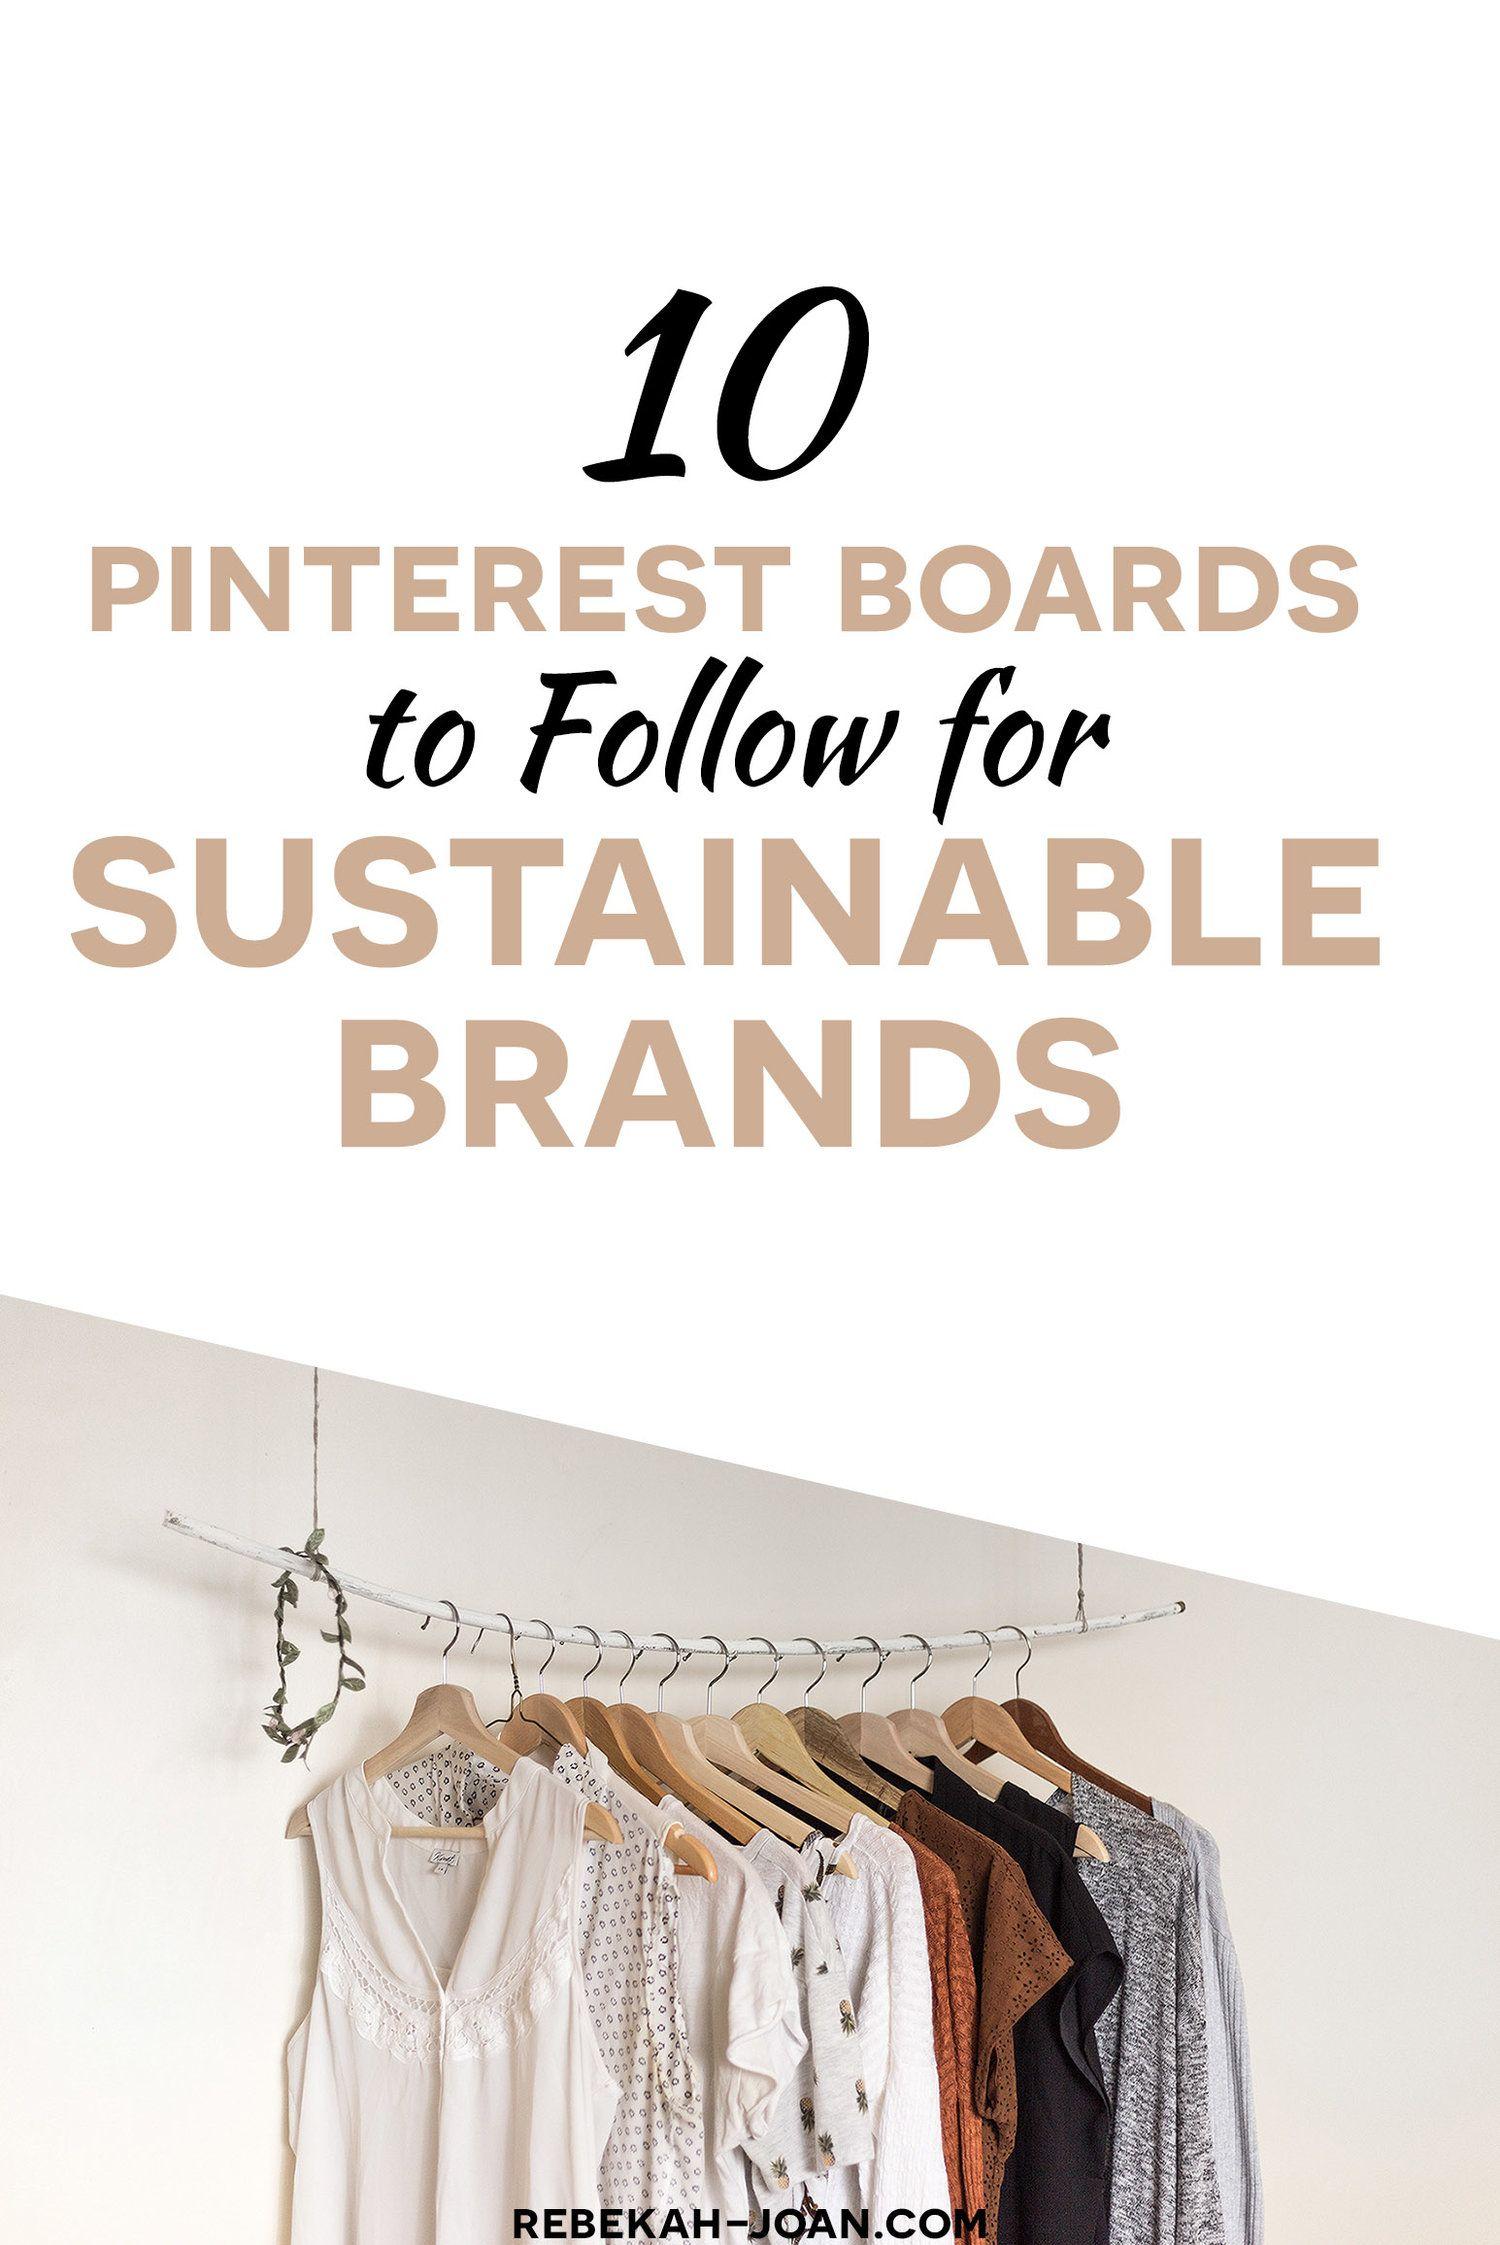 Pinterest Boards to Follow for Sustainable Brands — Rebekah Joan